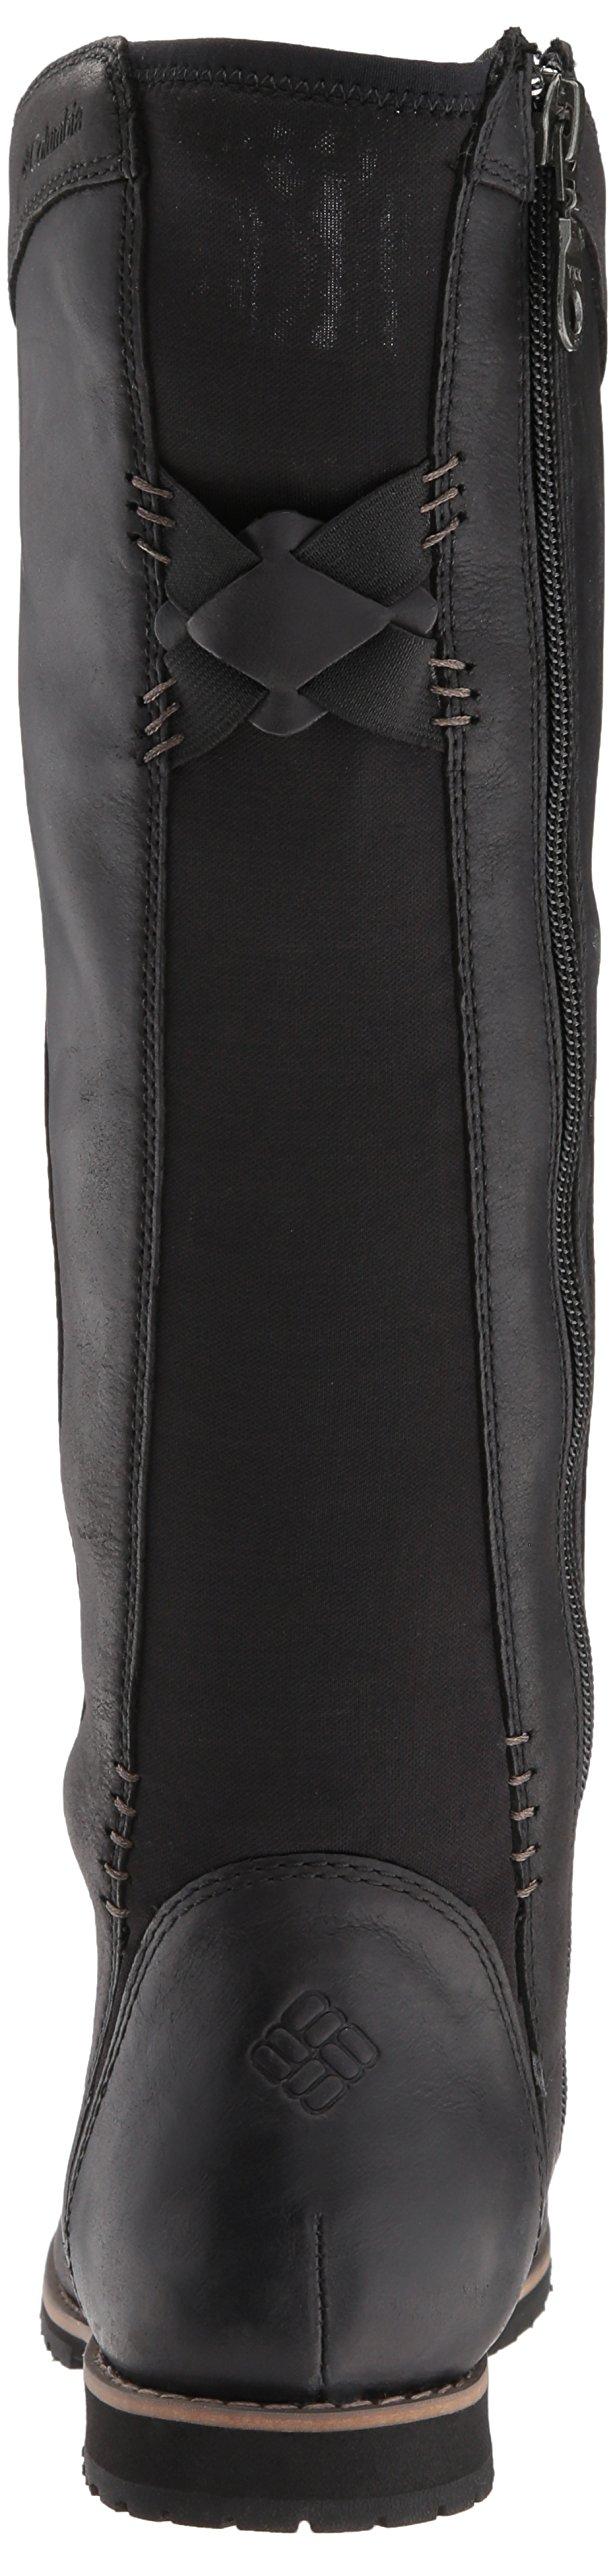 Columbia Women's Twentythird Ave Waterproof Tall Boot Uniform Dress Shoe, Black, Mud, 9 B US by Columbia (Image #2)